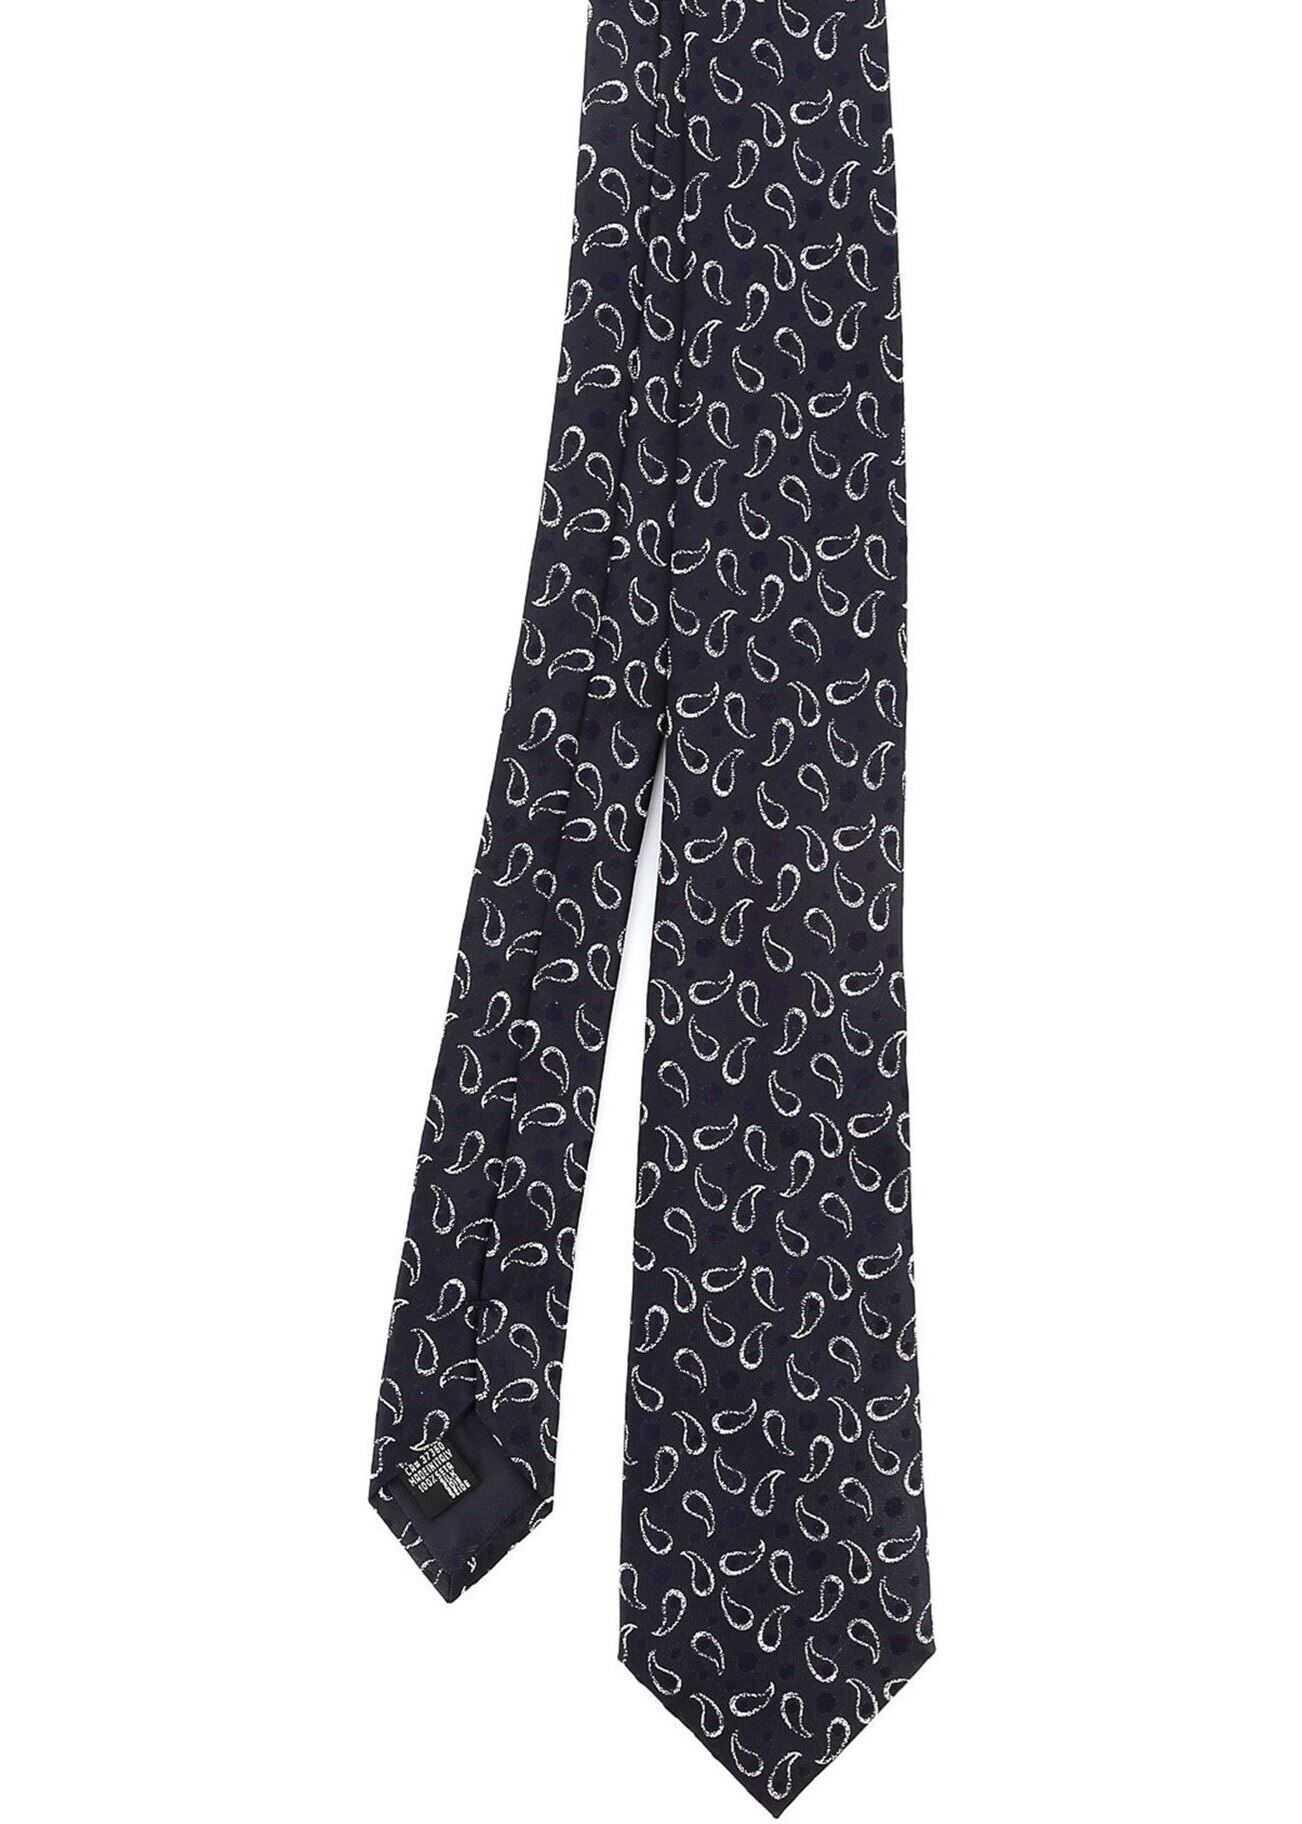 Emporio Armani Paisley Tie In Night Blue Blue